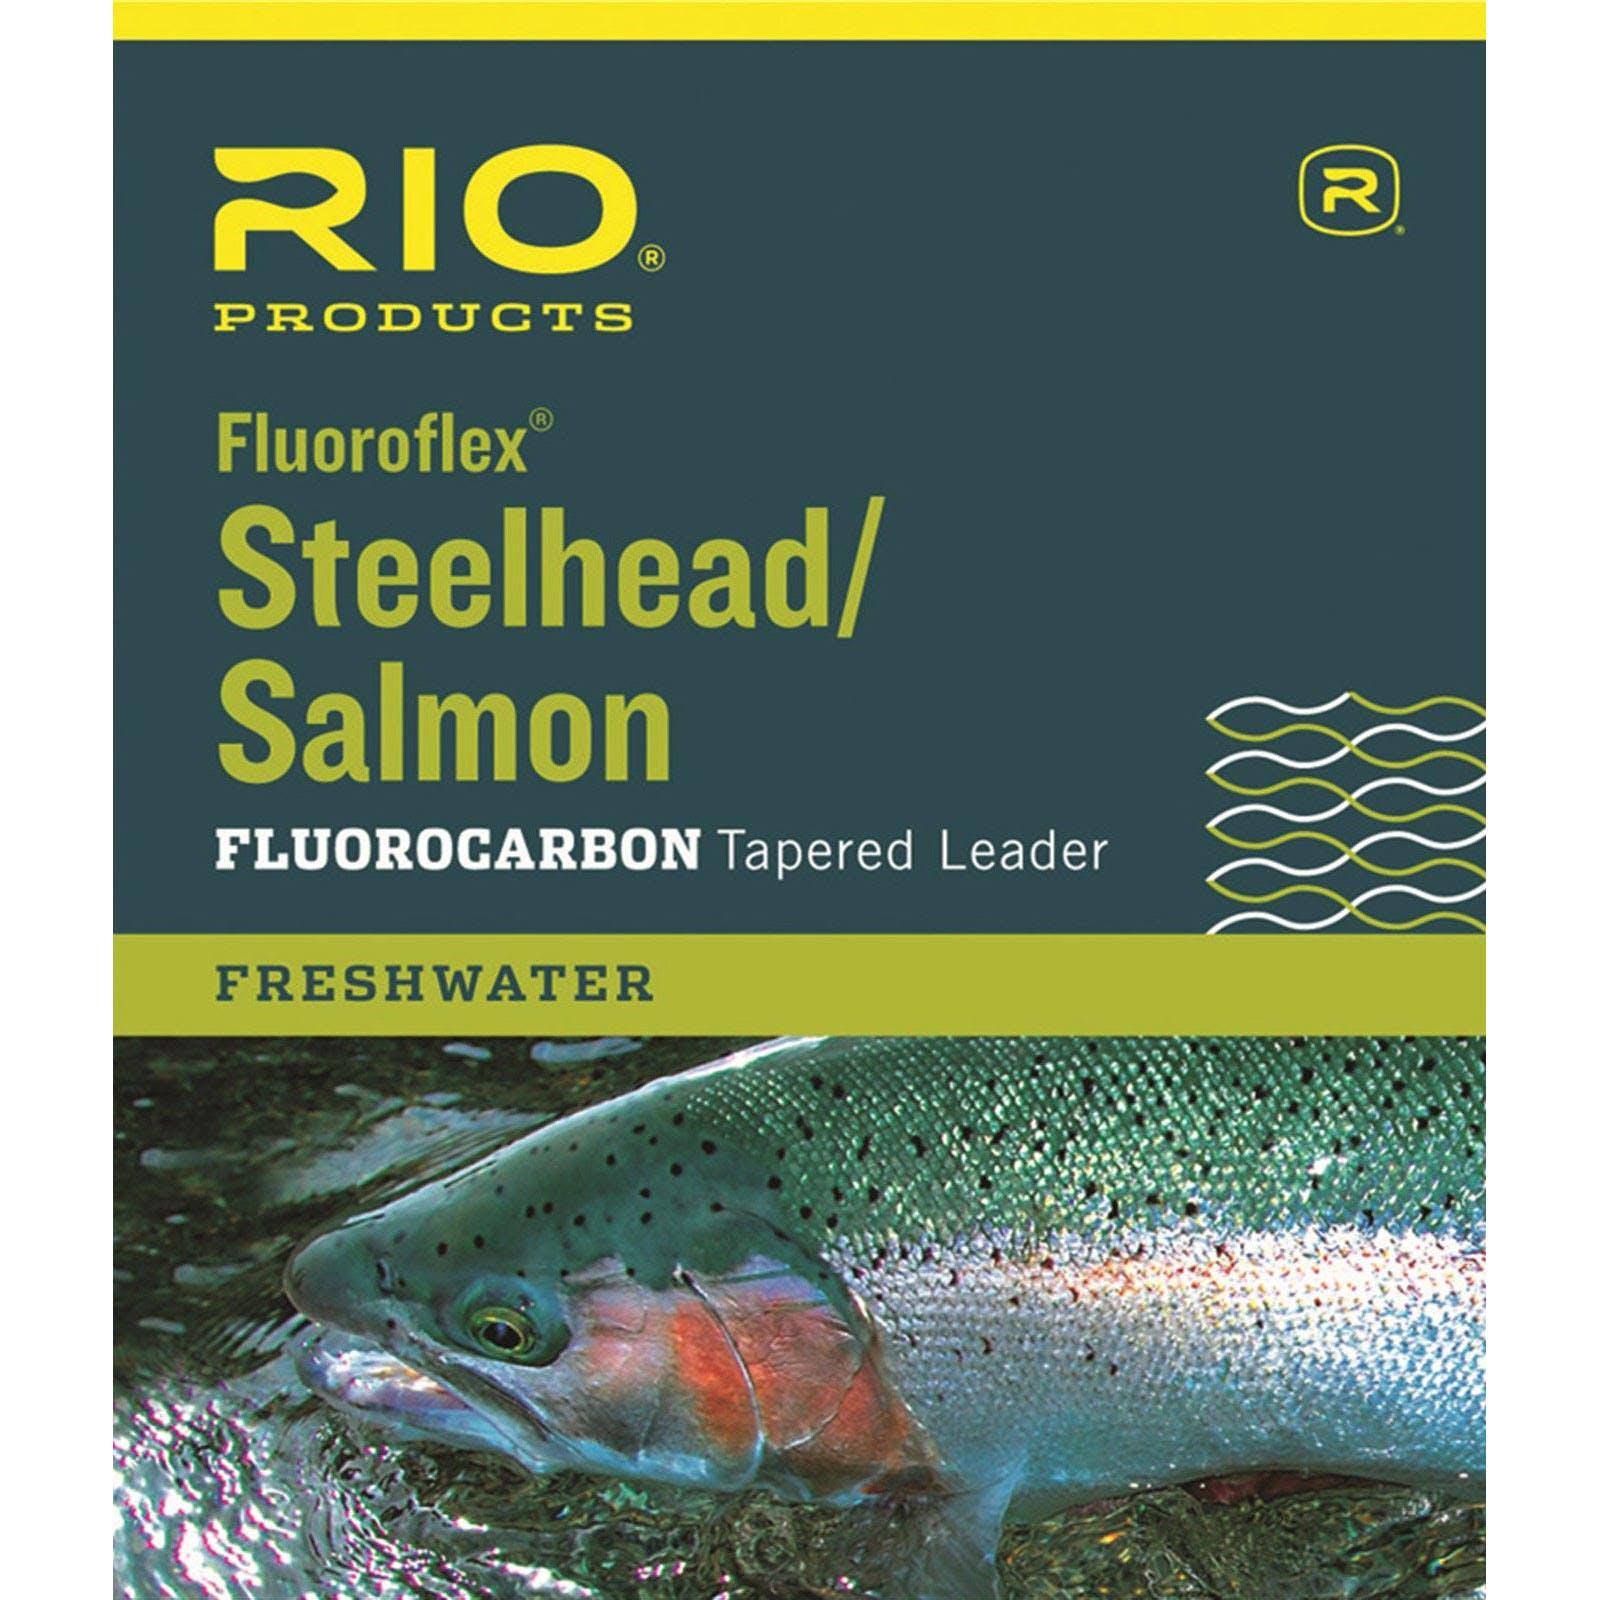 Rio Fluoroflex 9' Steelhead/Salmon Leader, 10lb.